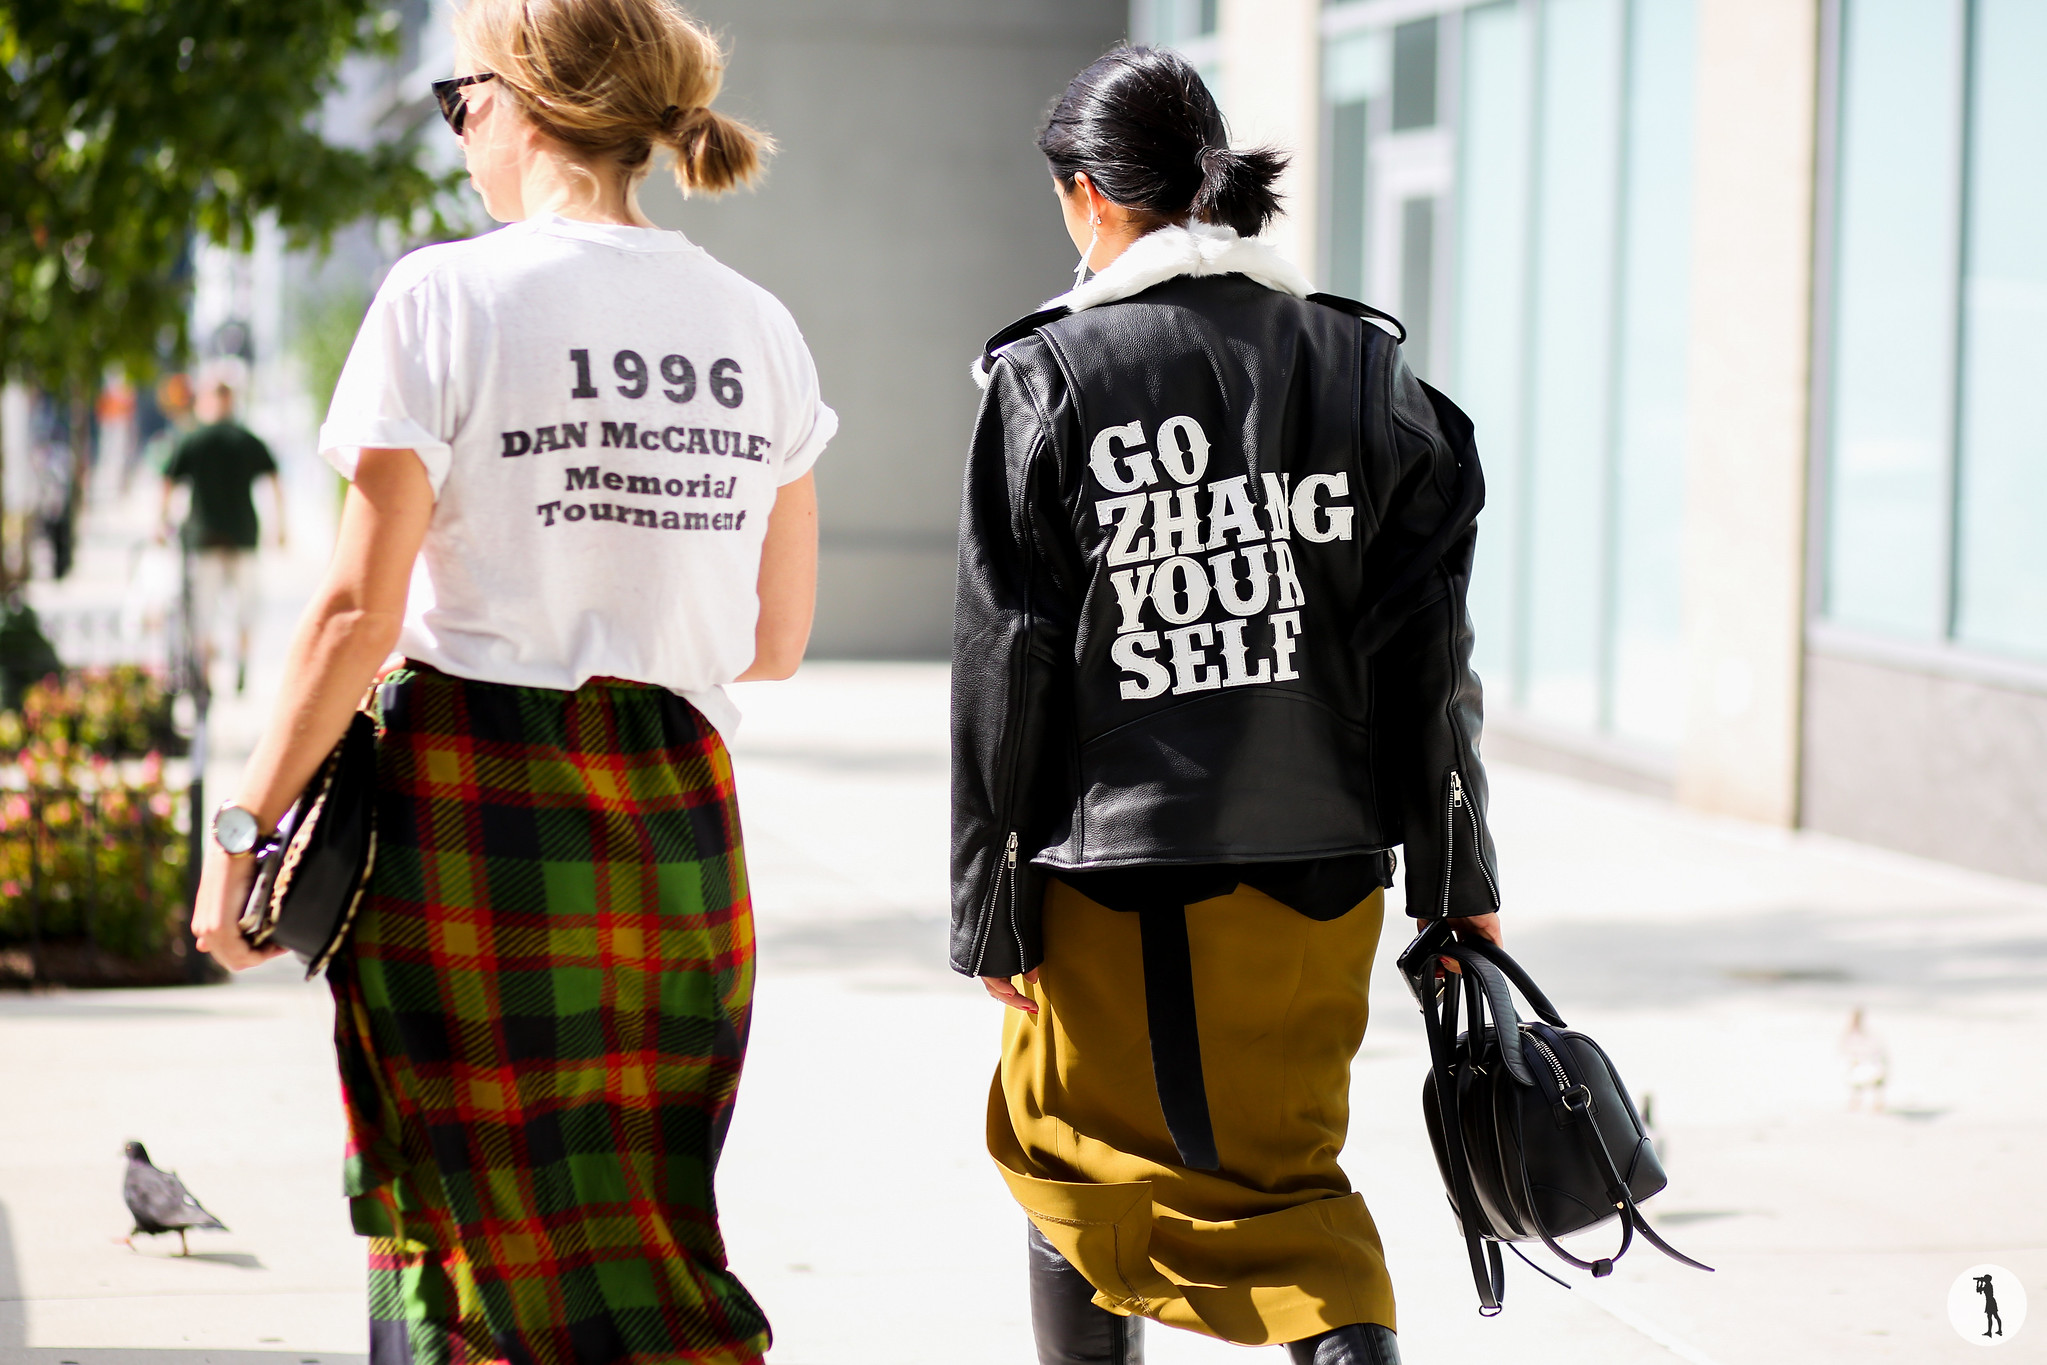 Chloe King and Margaret Zhang at New York Fashion Week